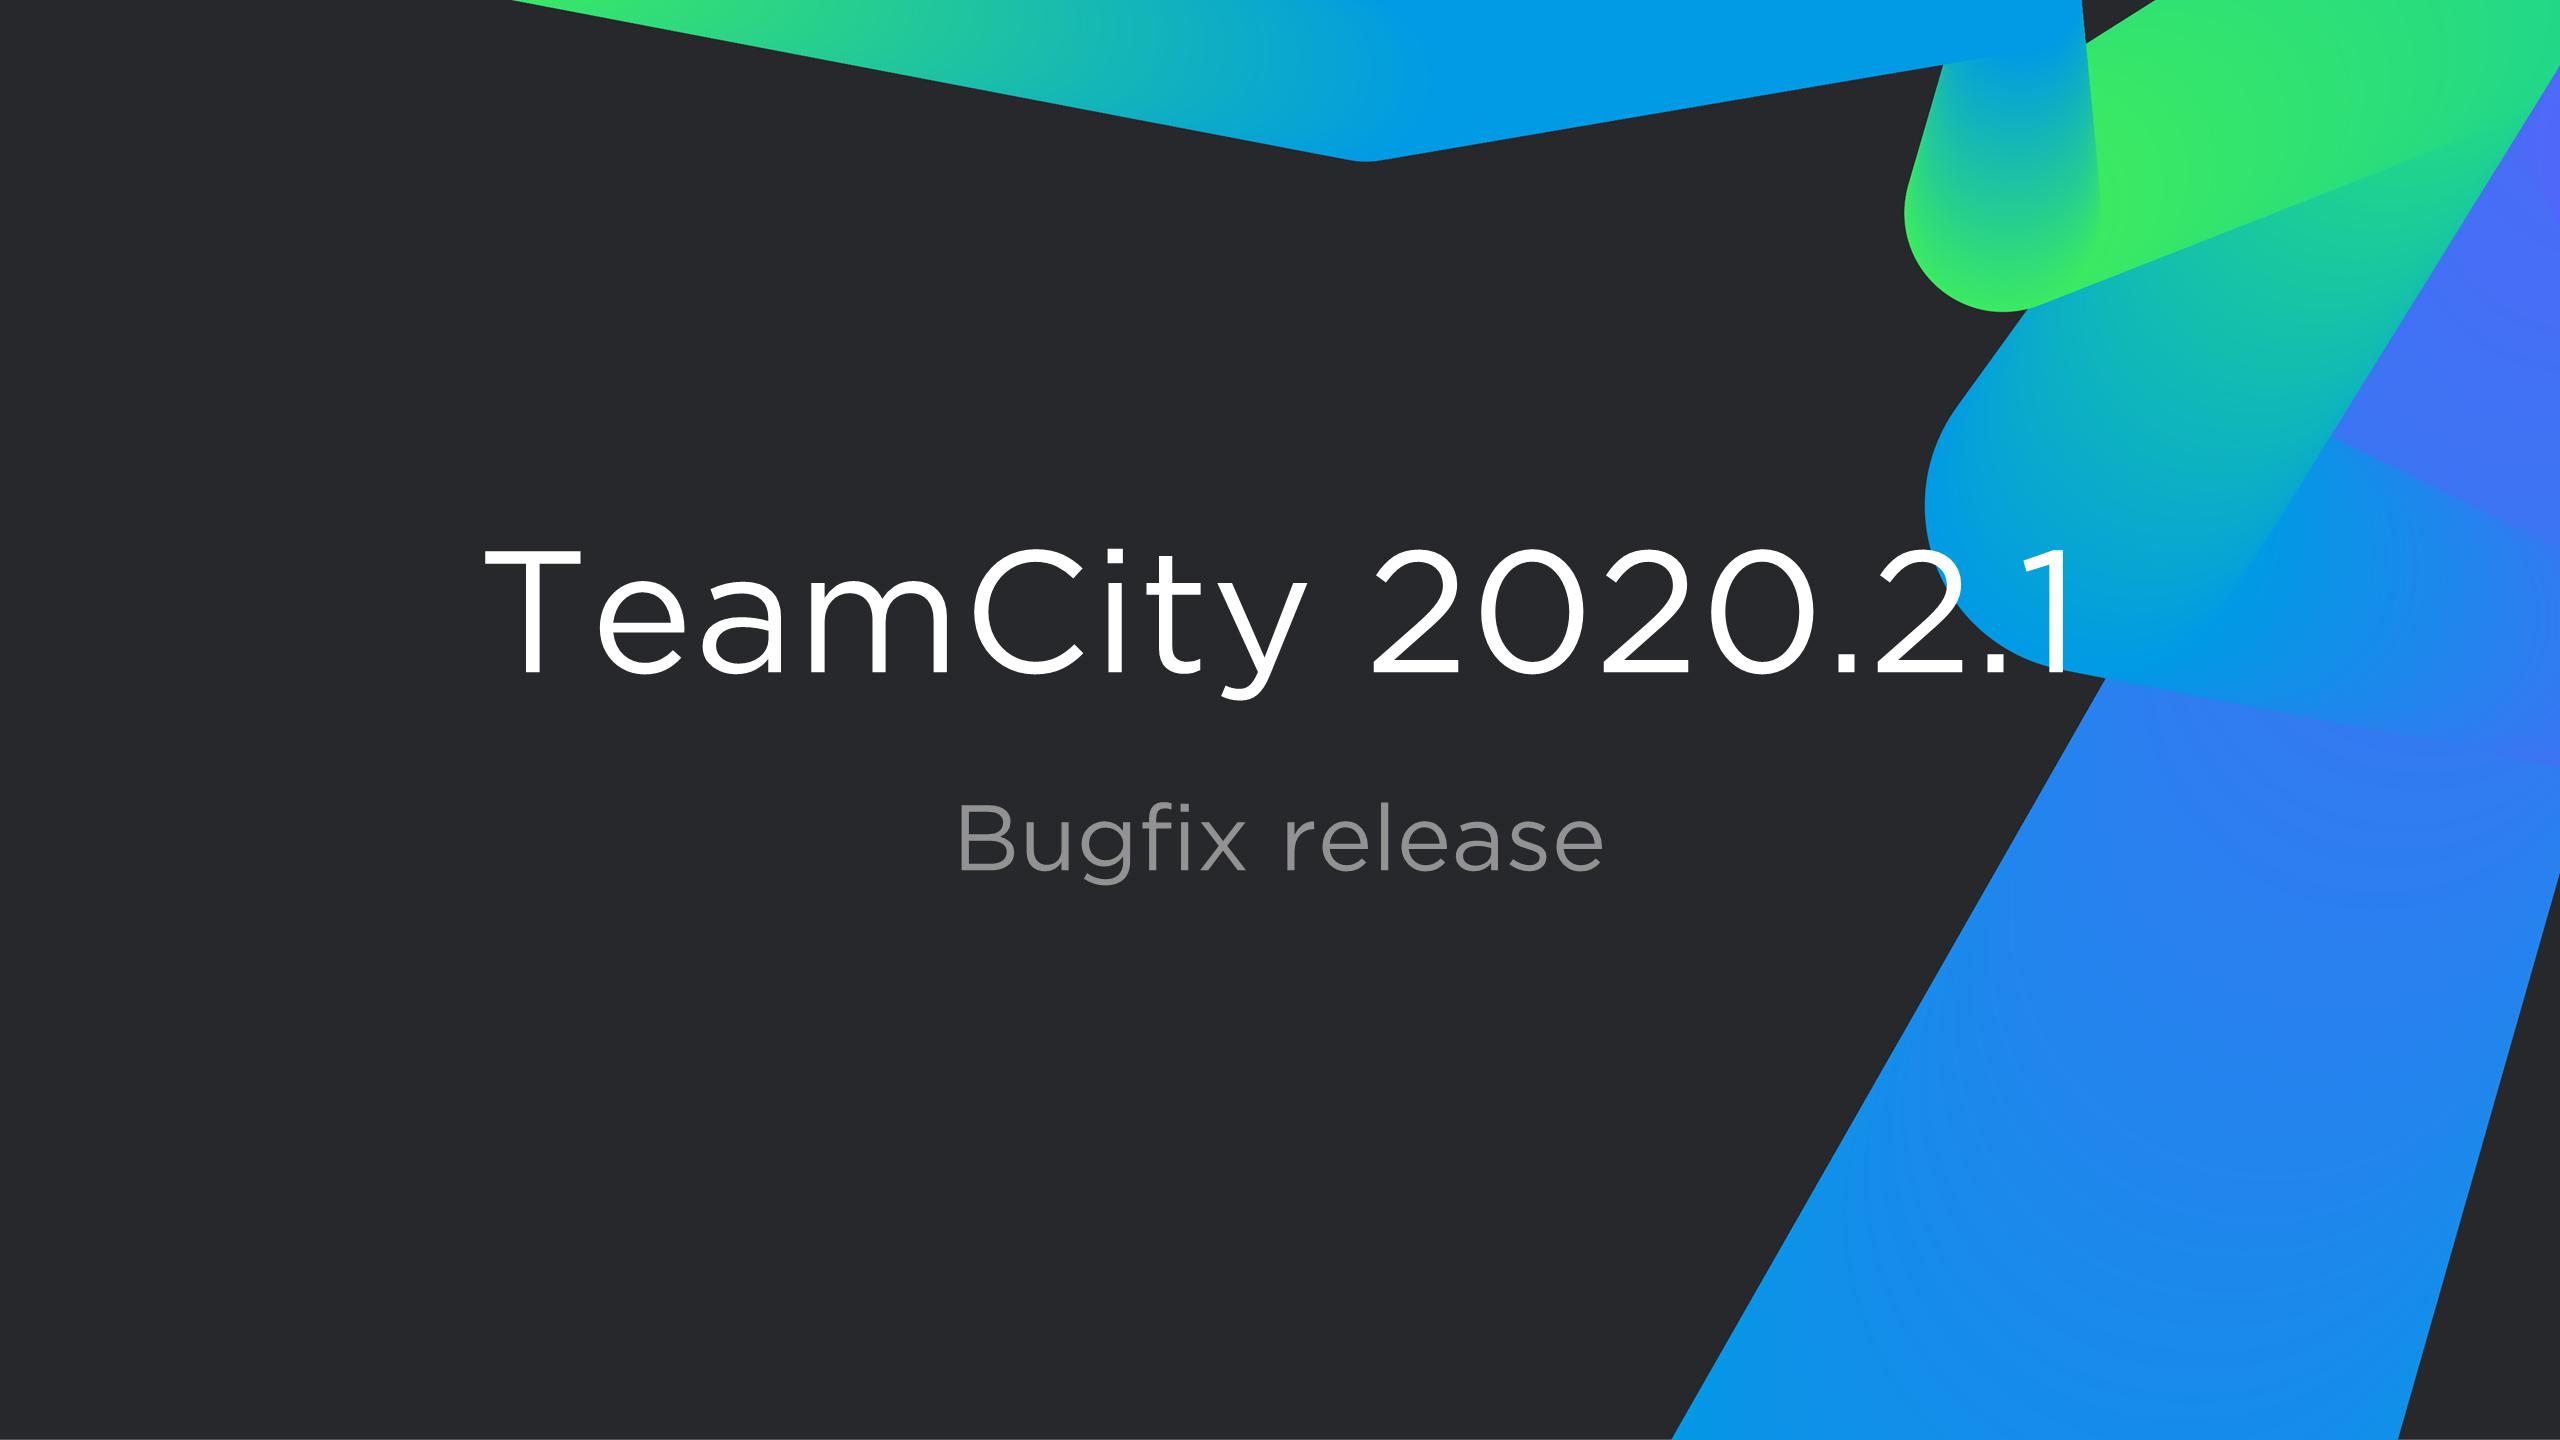 TeamCity 2020.2.1